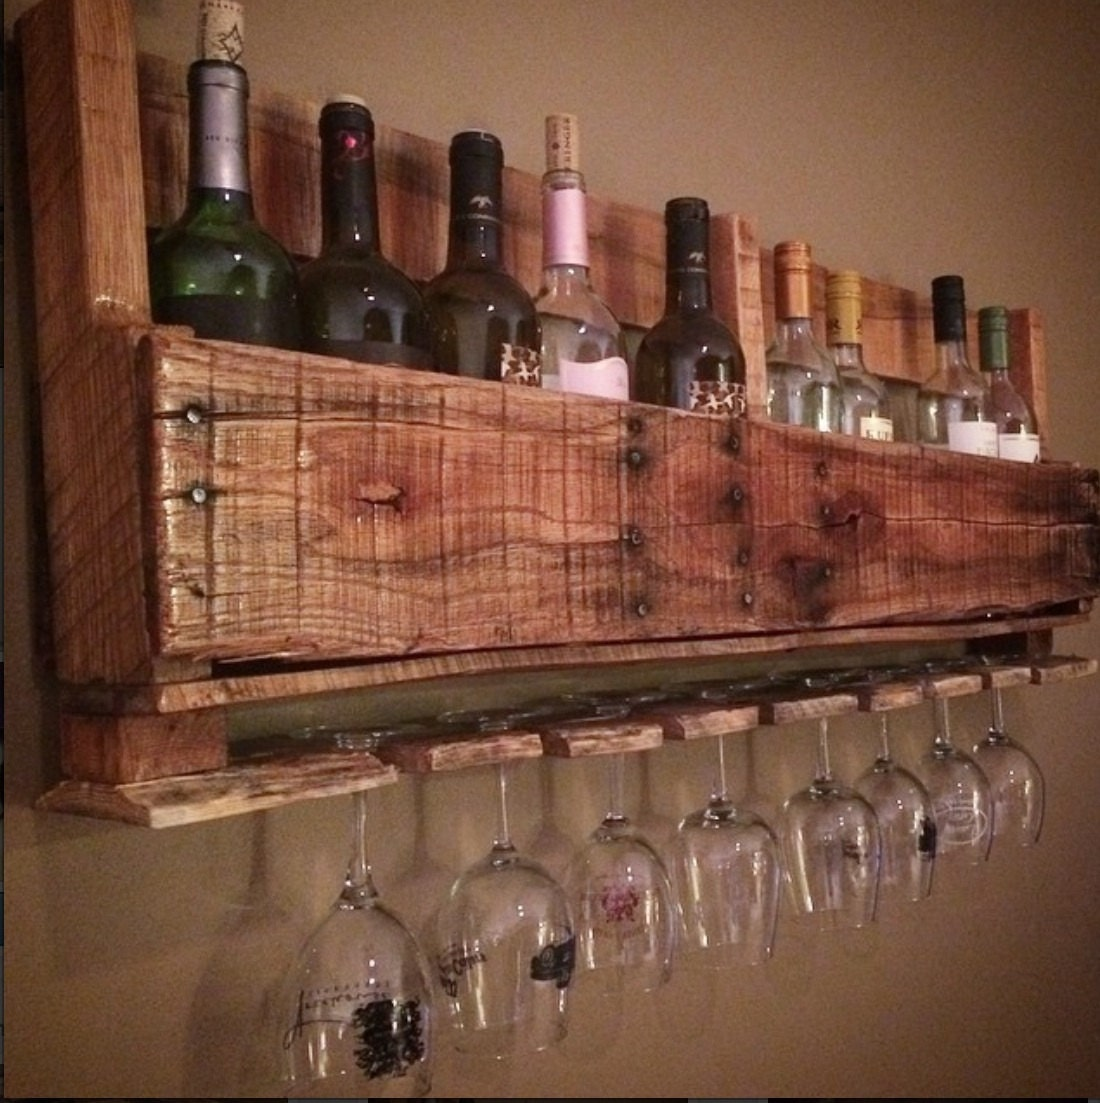 Custom rustic wine bar rack by awrestoration on etsy for Custom wine bar